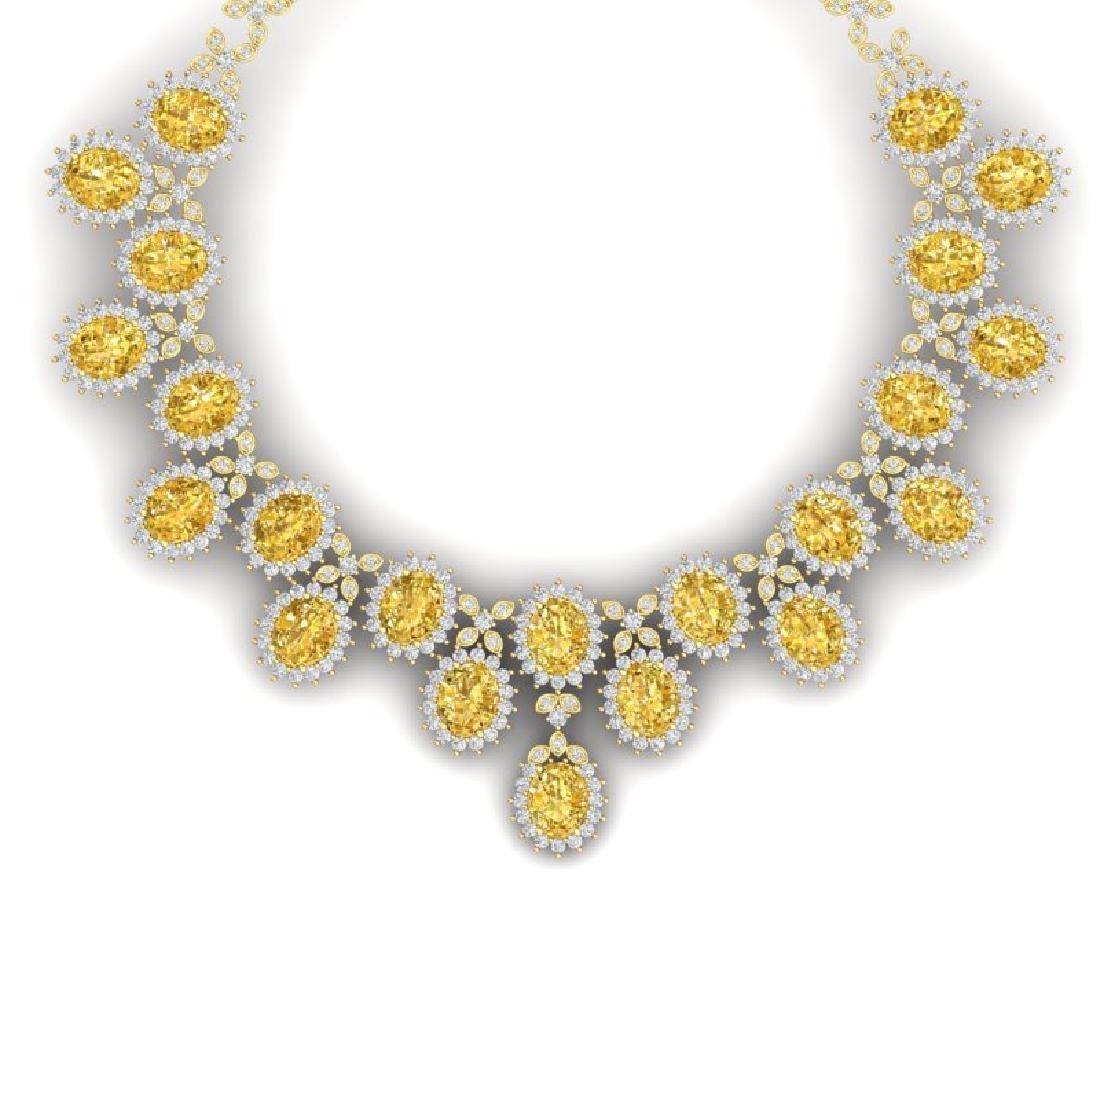 76 CTW Royalty Canary Citrine & VS Diamond Necklace 18K